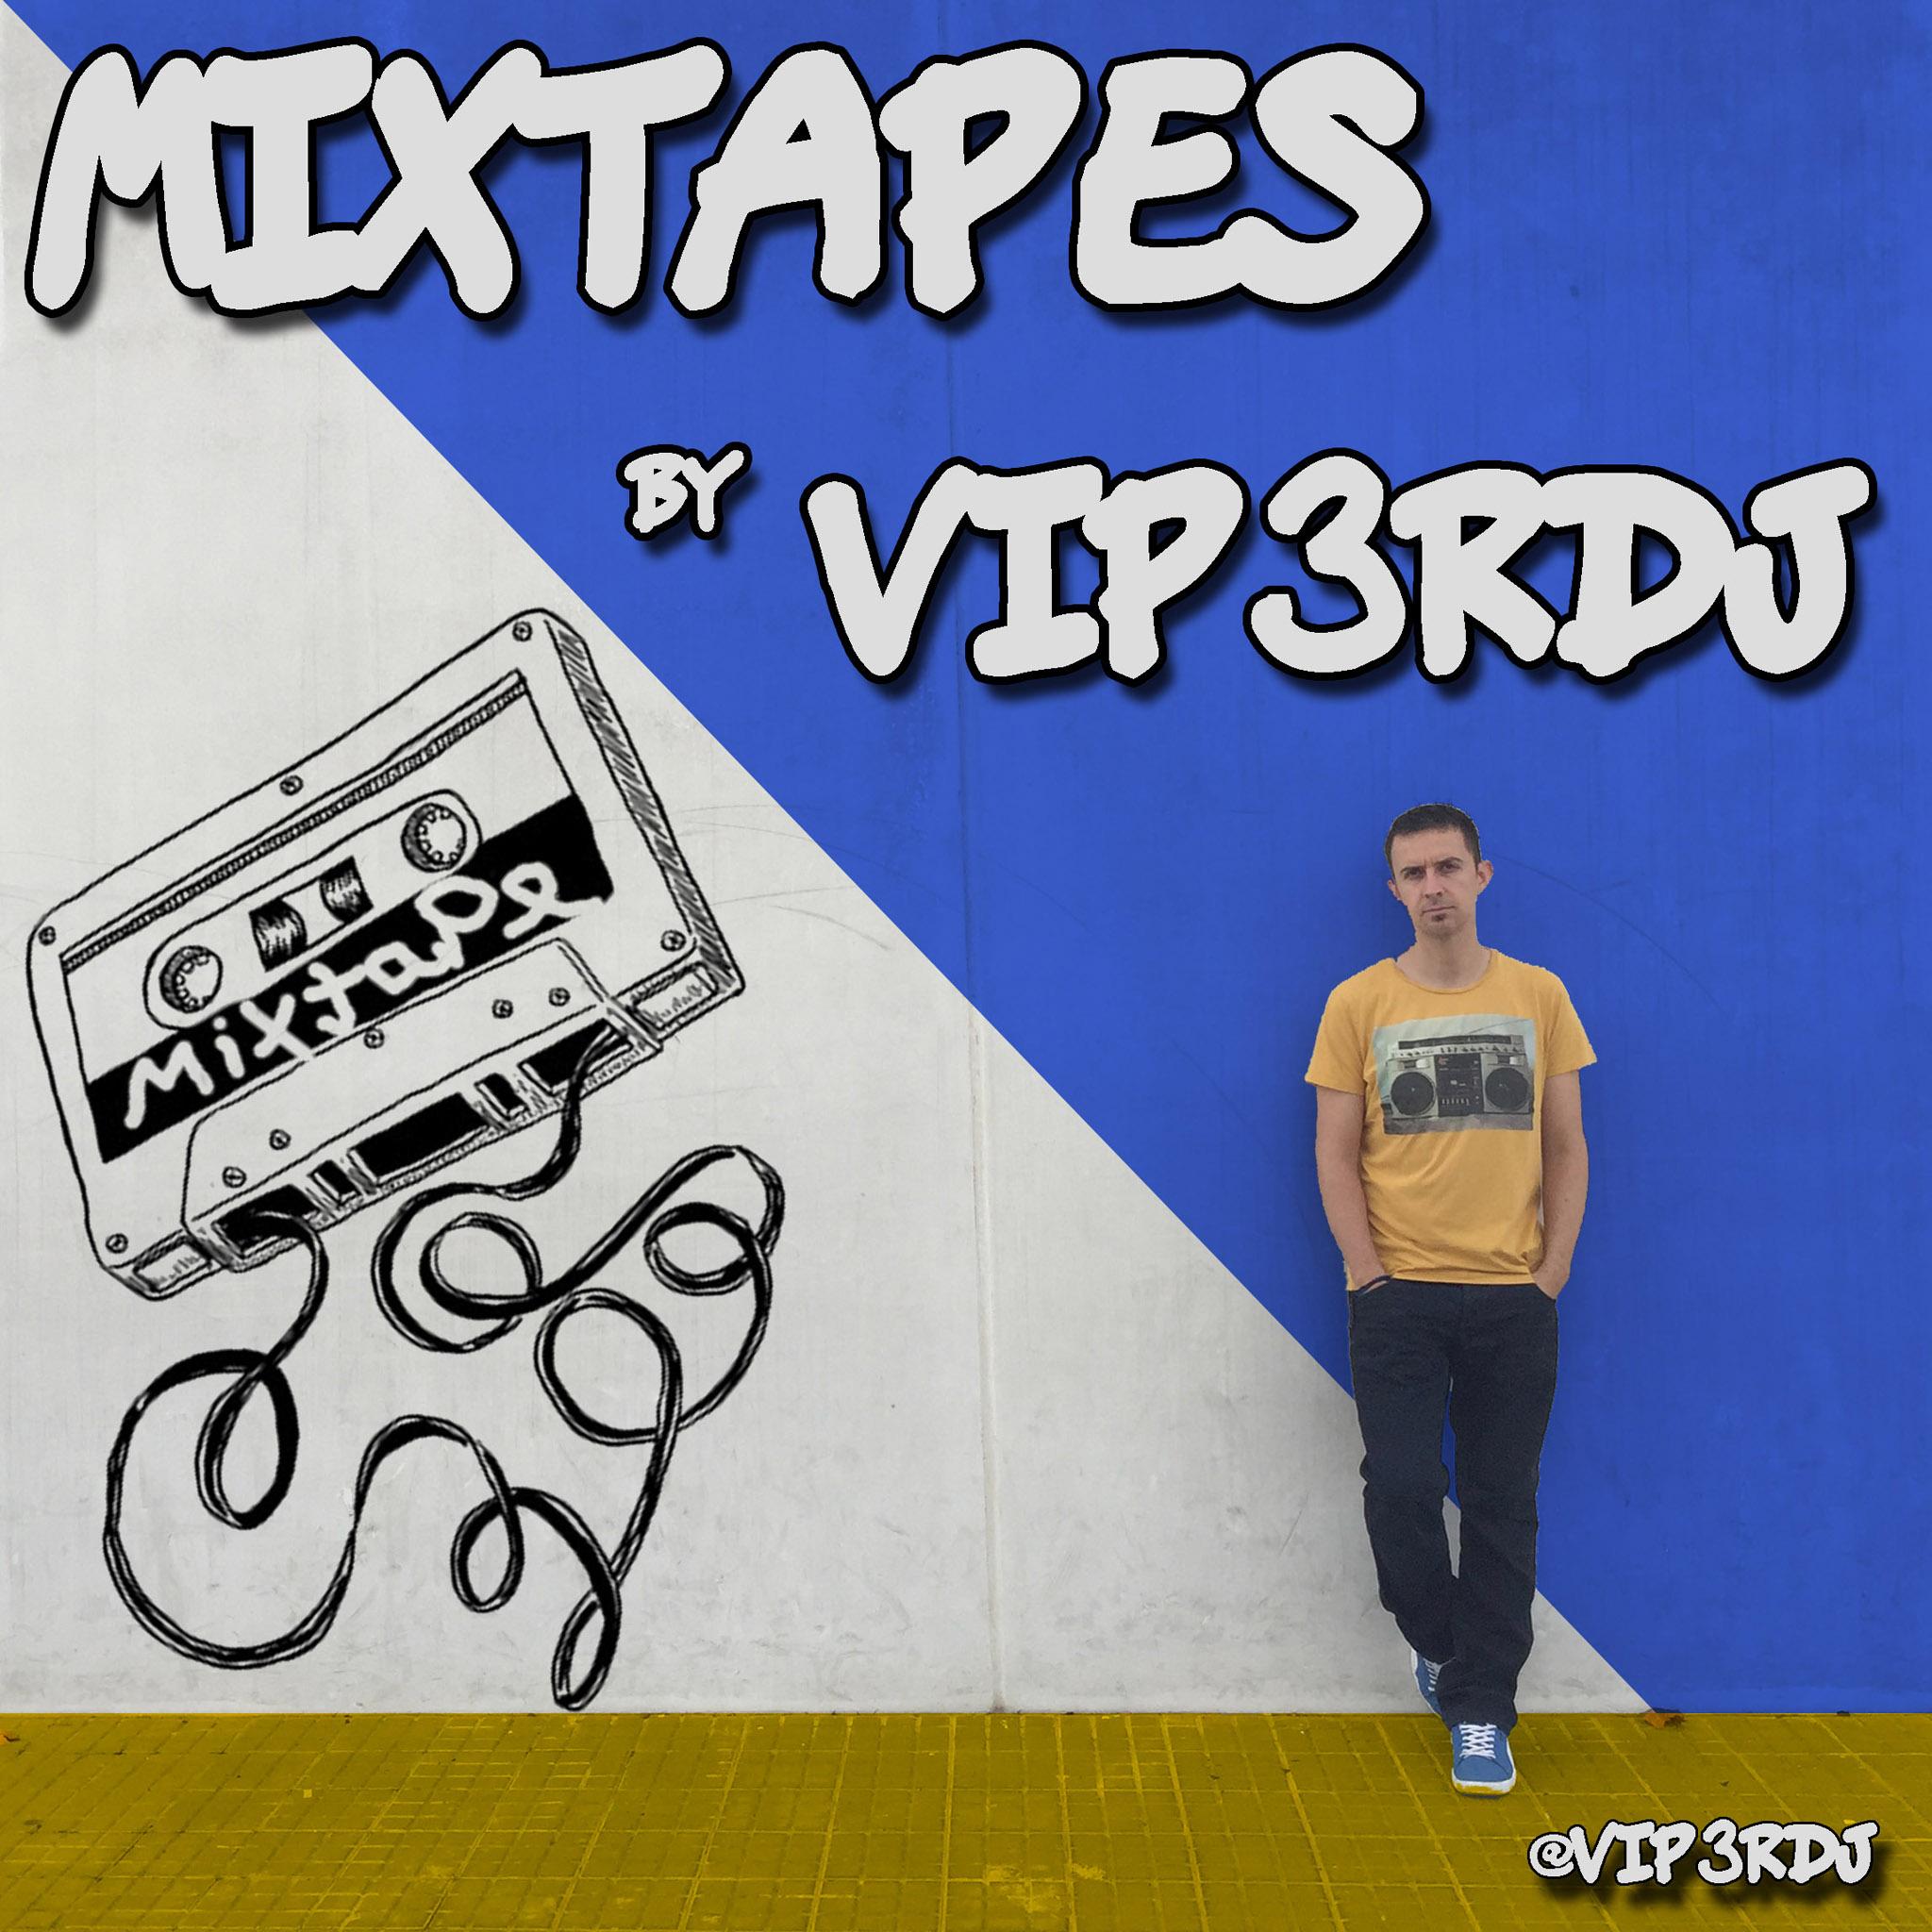 Mixtapes by Vip3rDJ